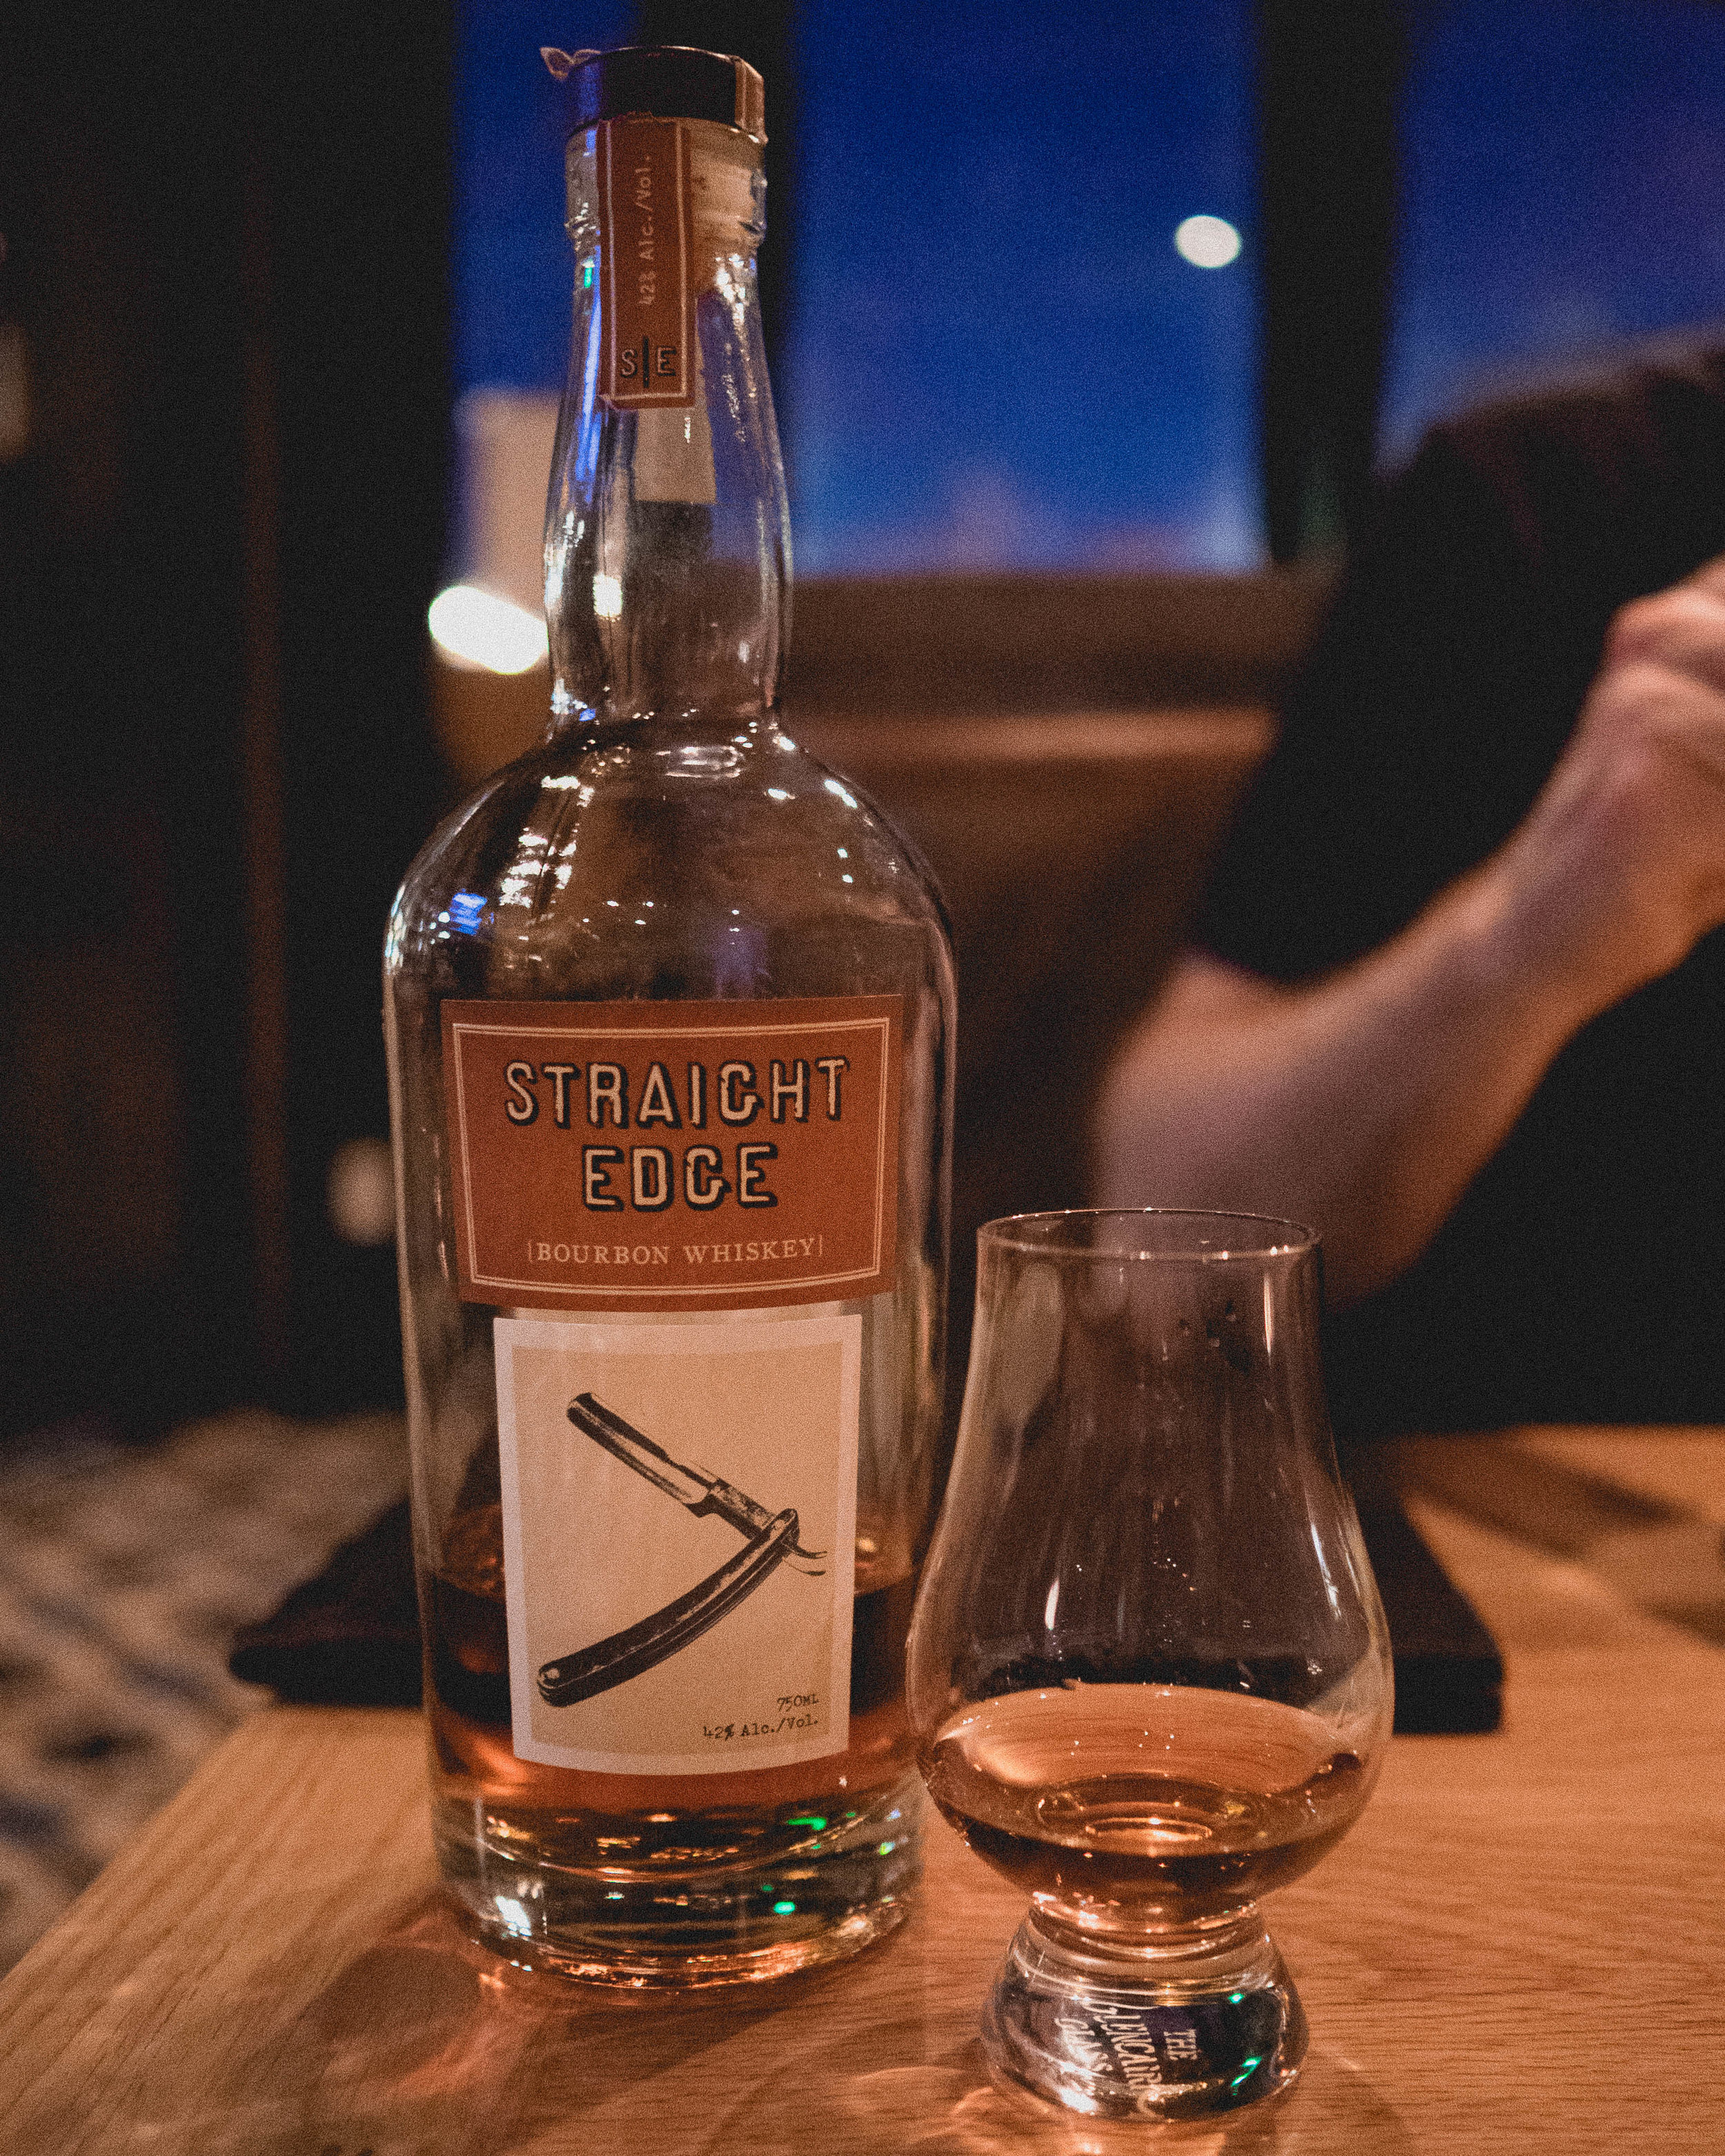 whisky #2:  straight edge  bourbon whiskey.